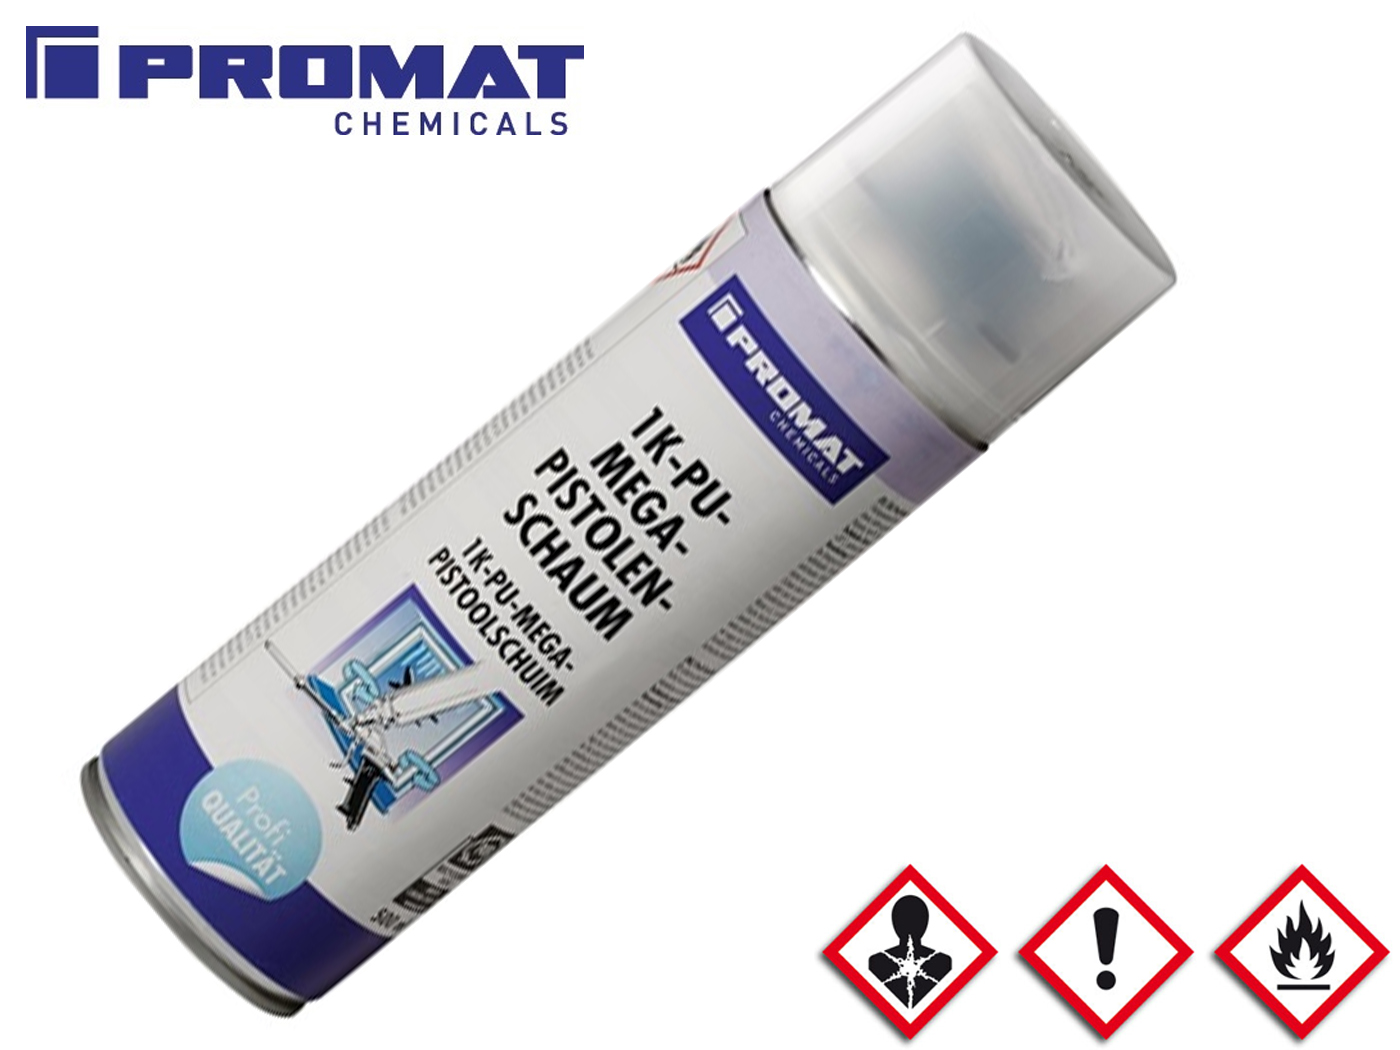 1C-pistoolschuim 500 ml B2 geel   DKMTools - DKM Tools